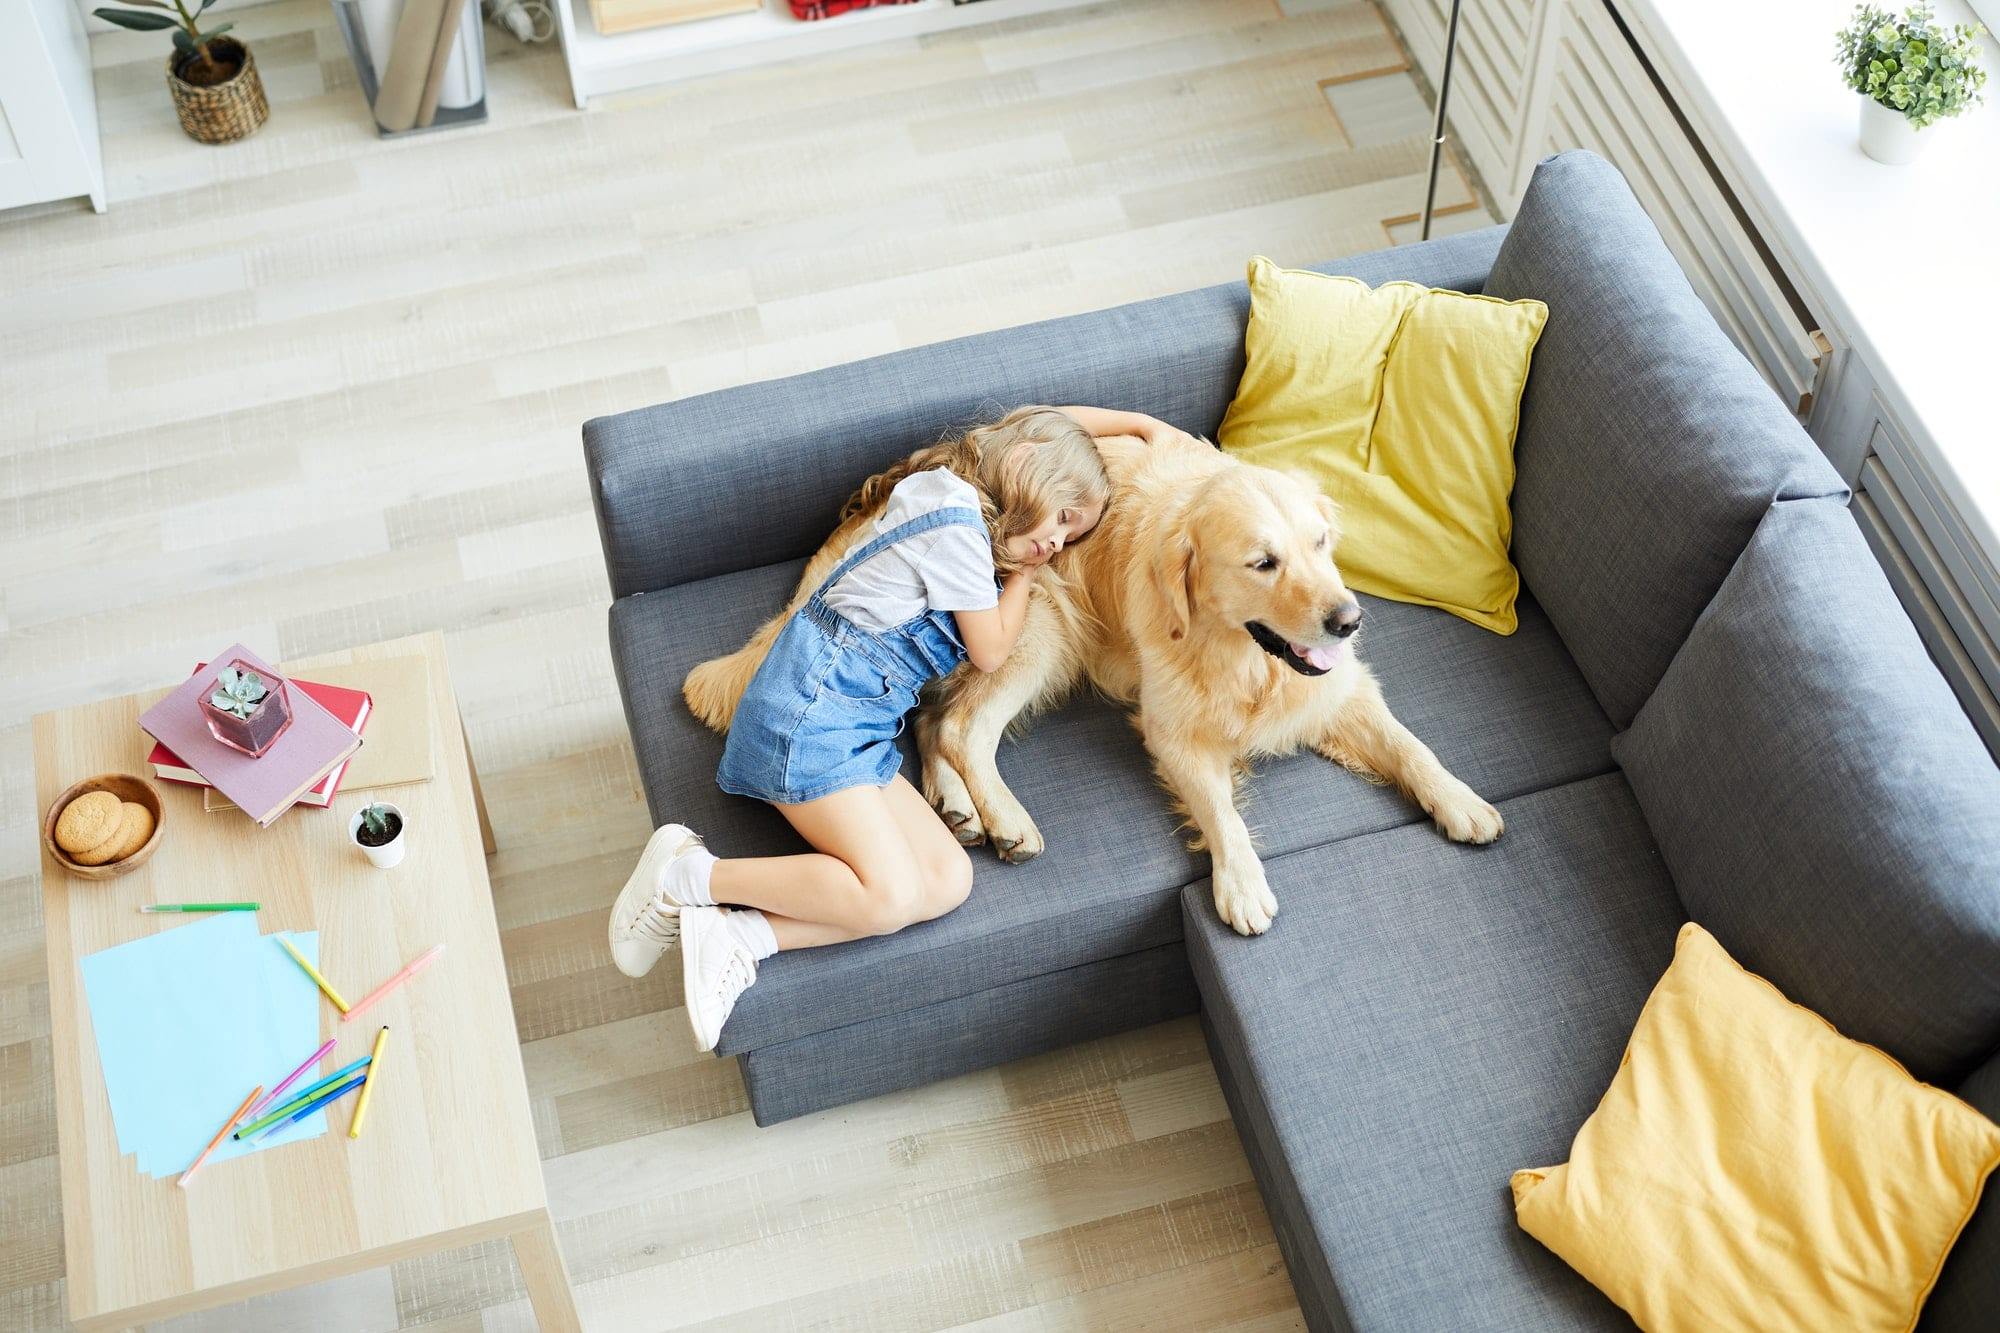 Sleeping with pet